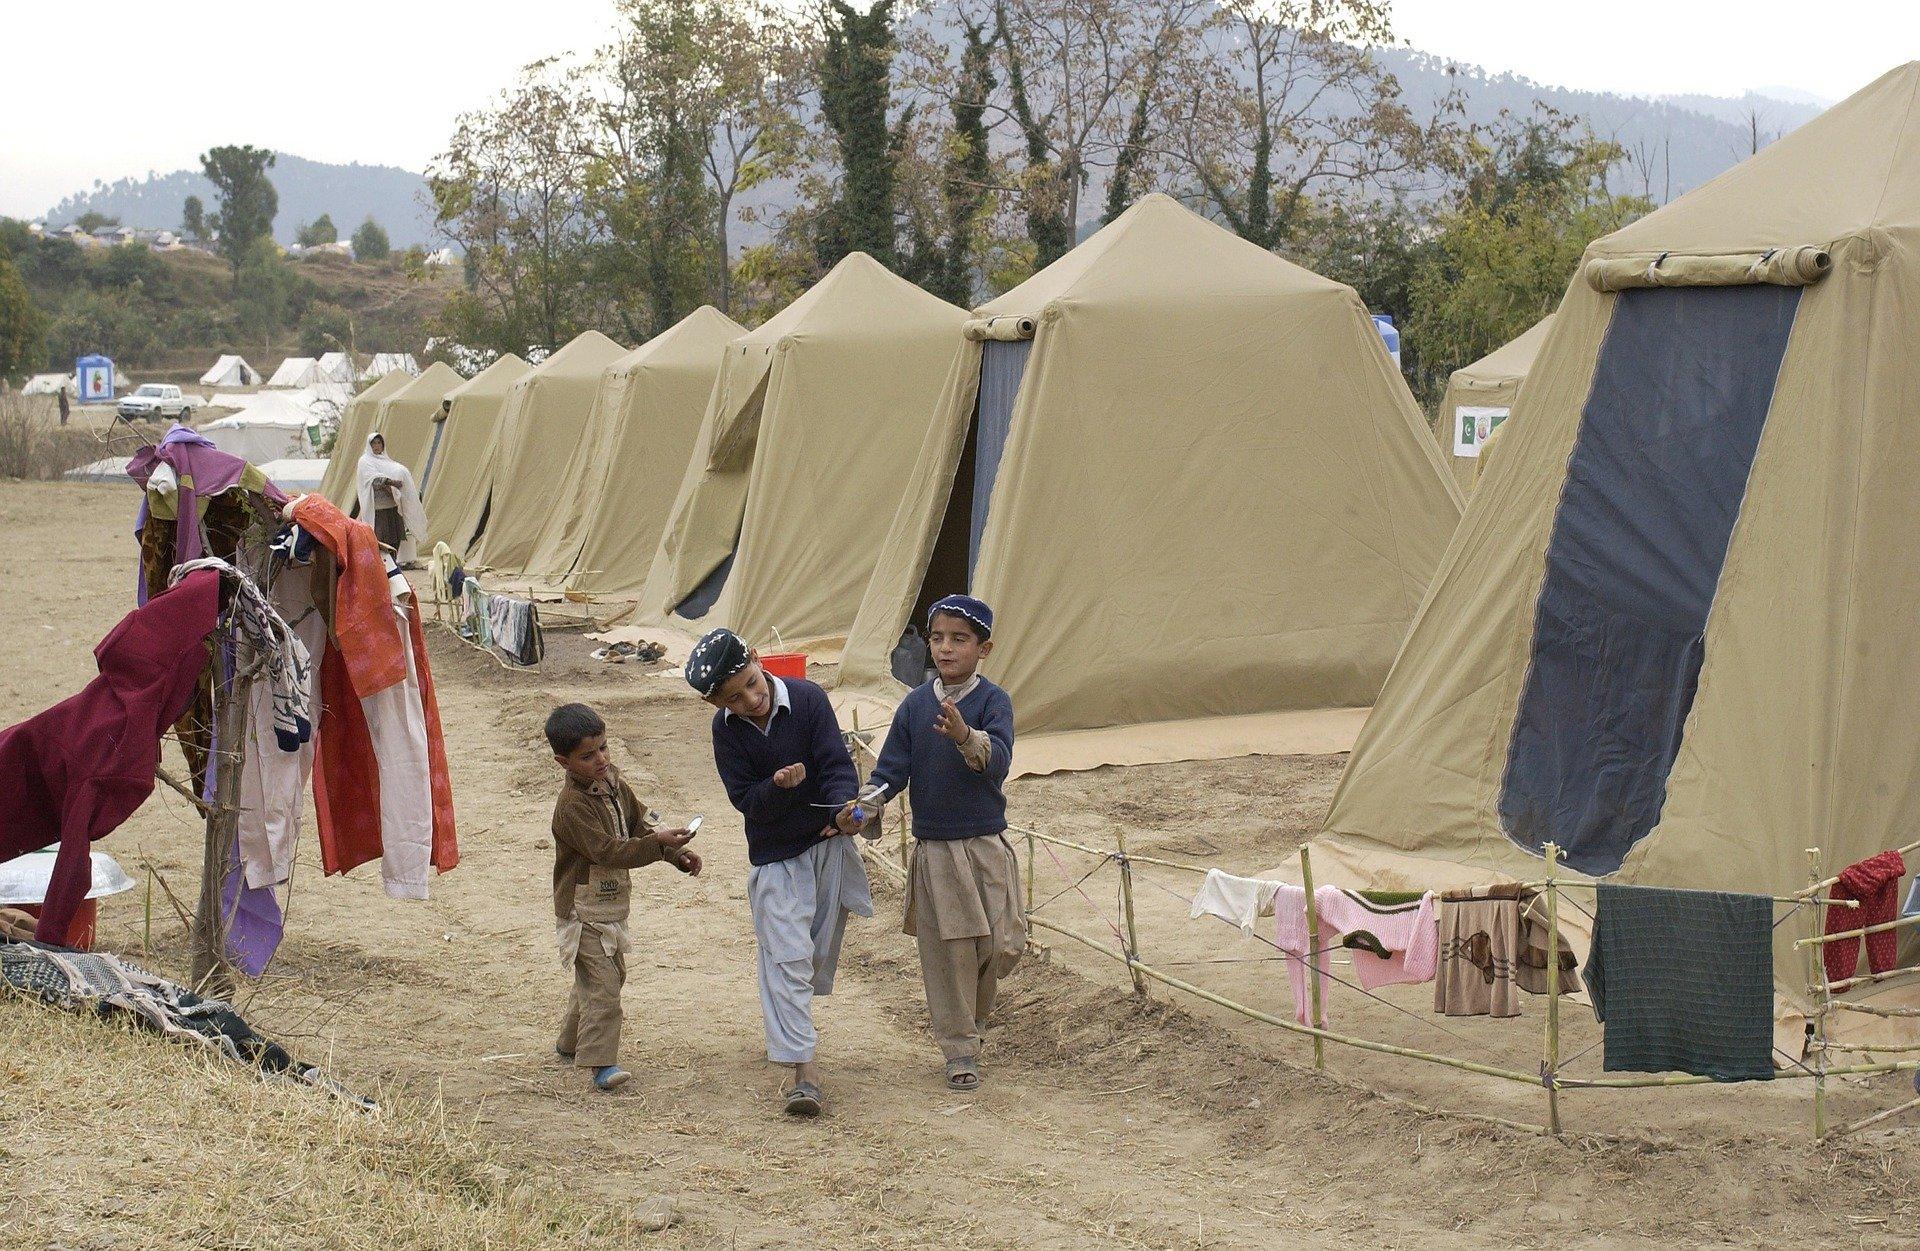 Flüchtlingslager Moria ist Coronavirus hilflos ausgeliefert